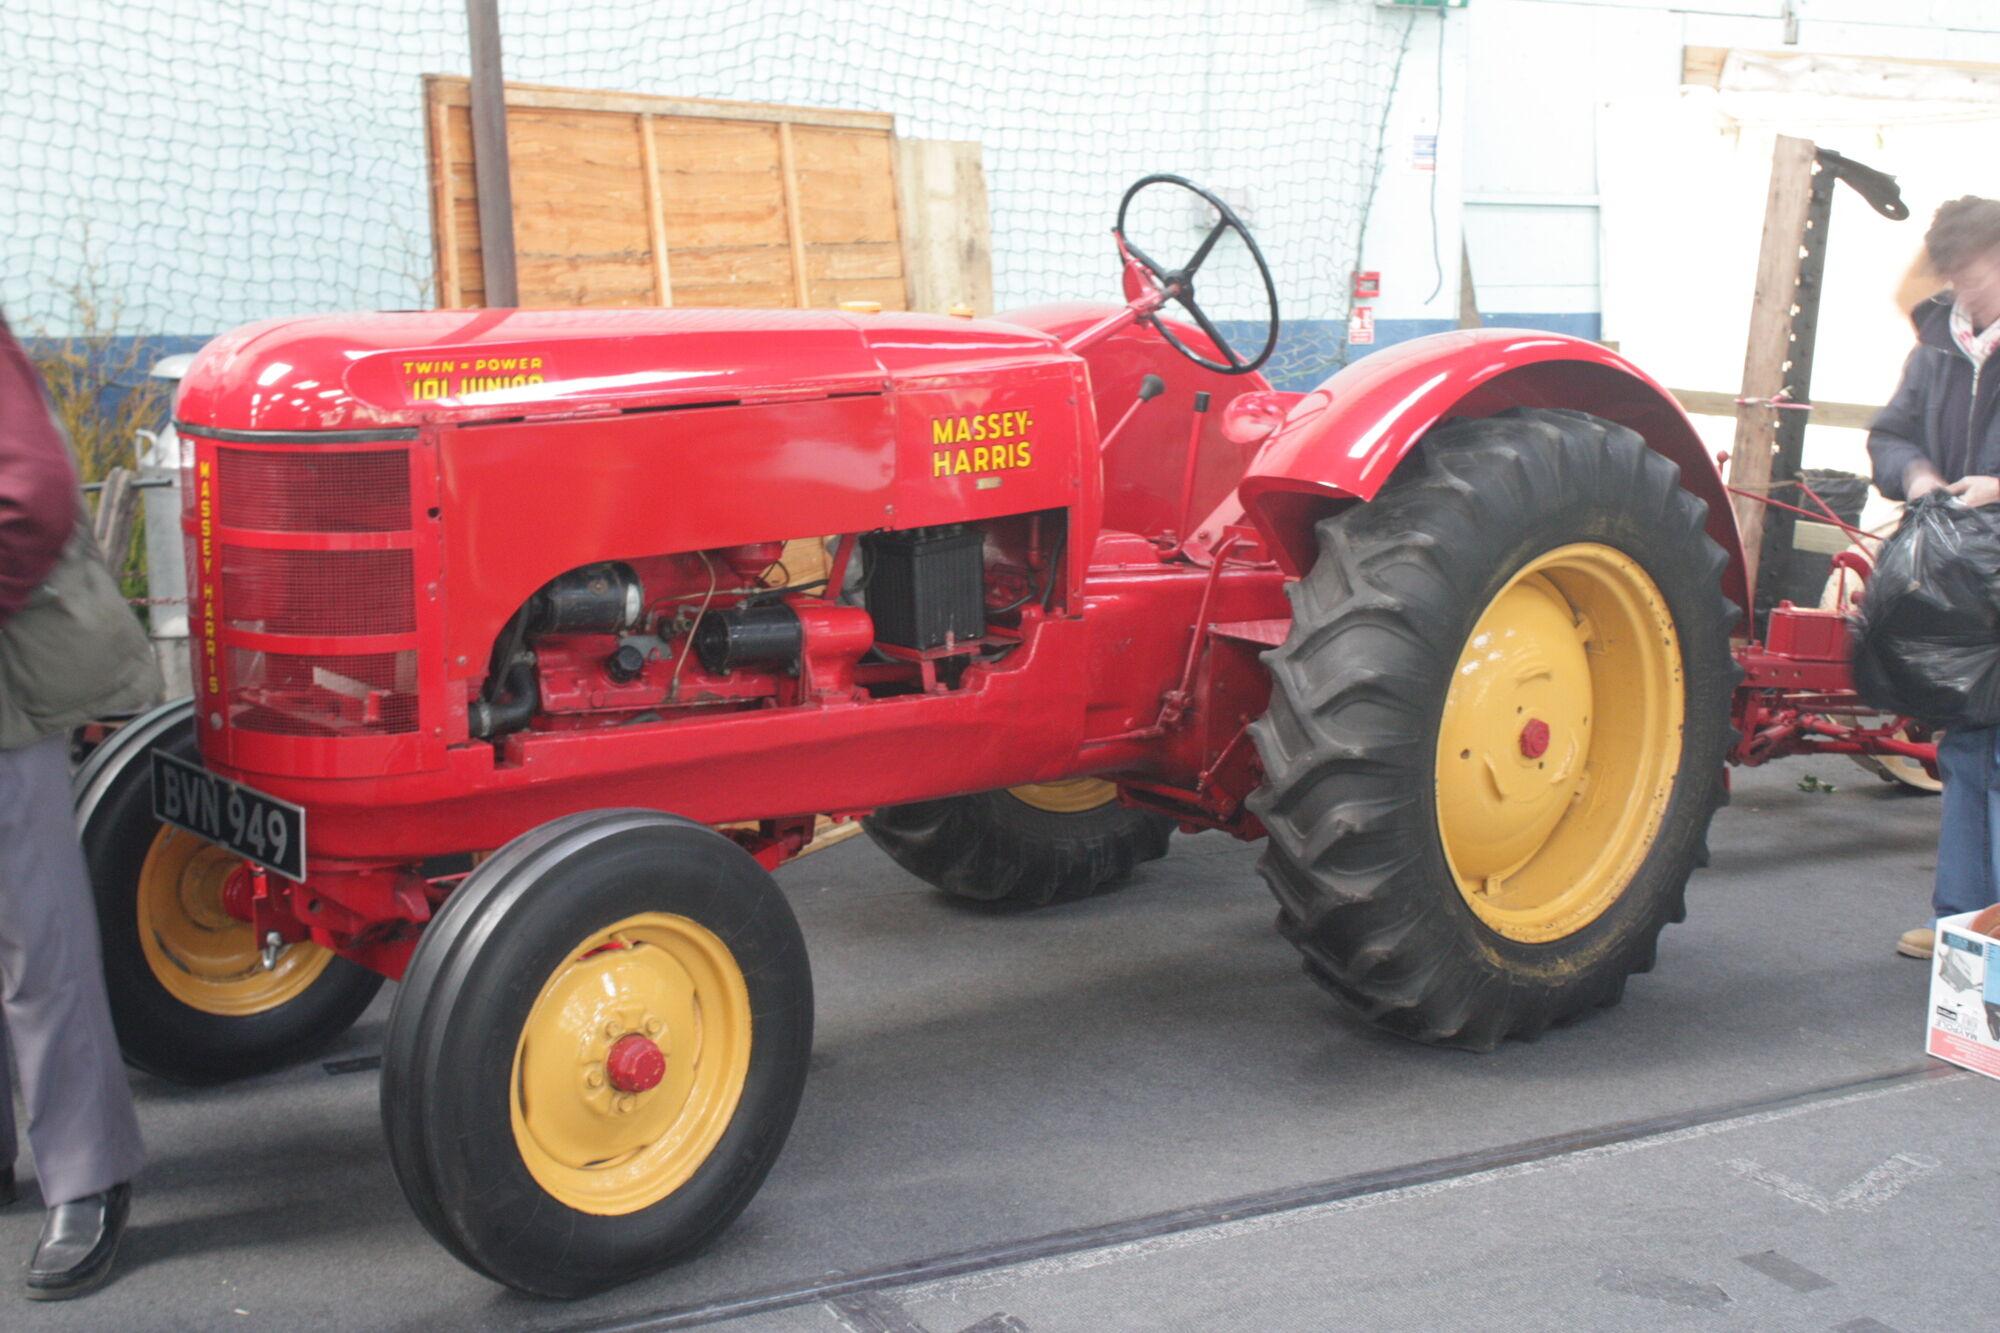 Massey Harris Tractor : Massey harris junior tractor construction plant